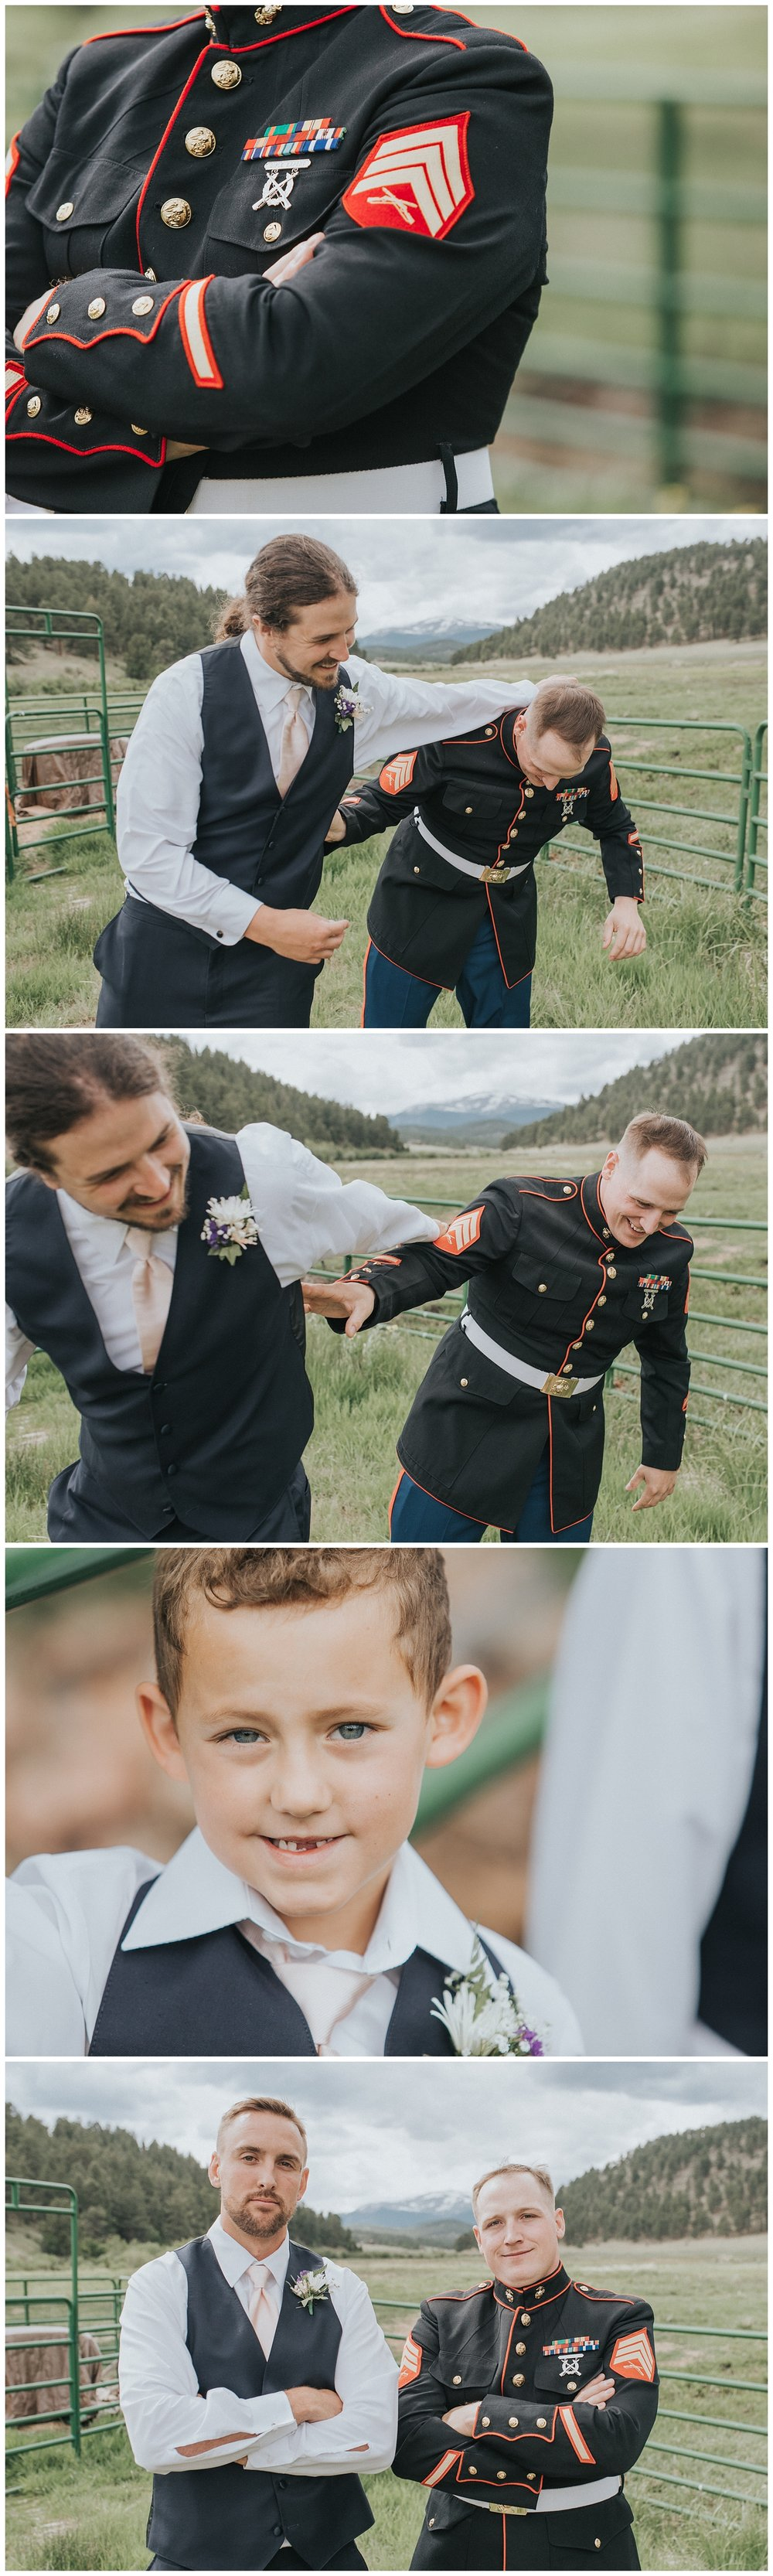 deer-creek-valley-ranch-wedding-photos_0044.jpg